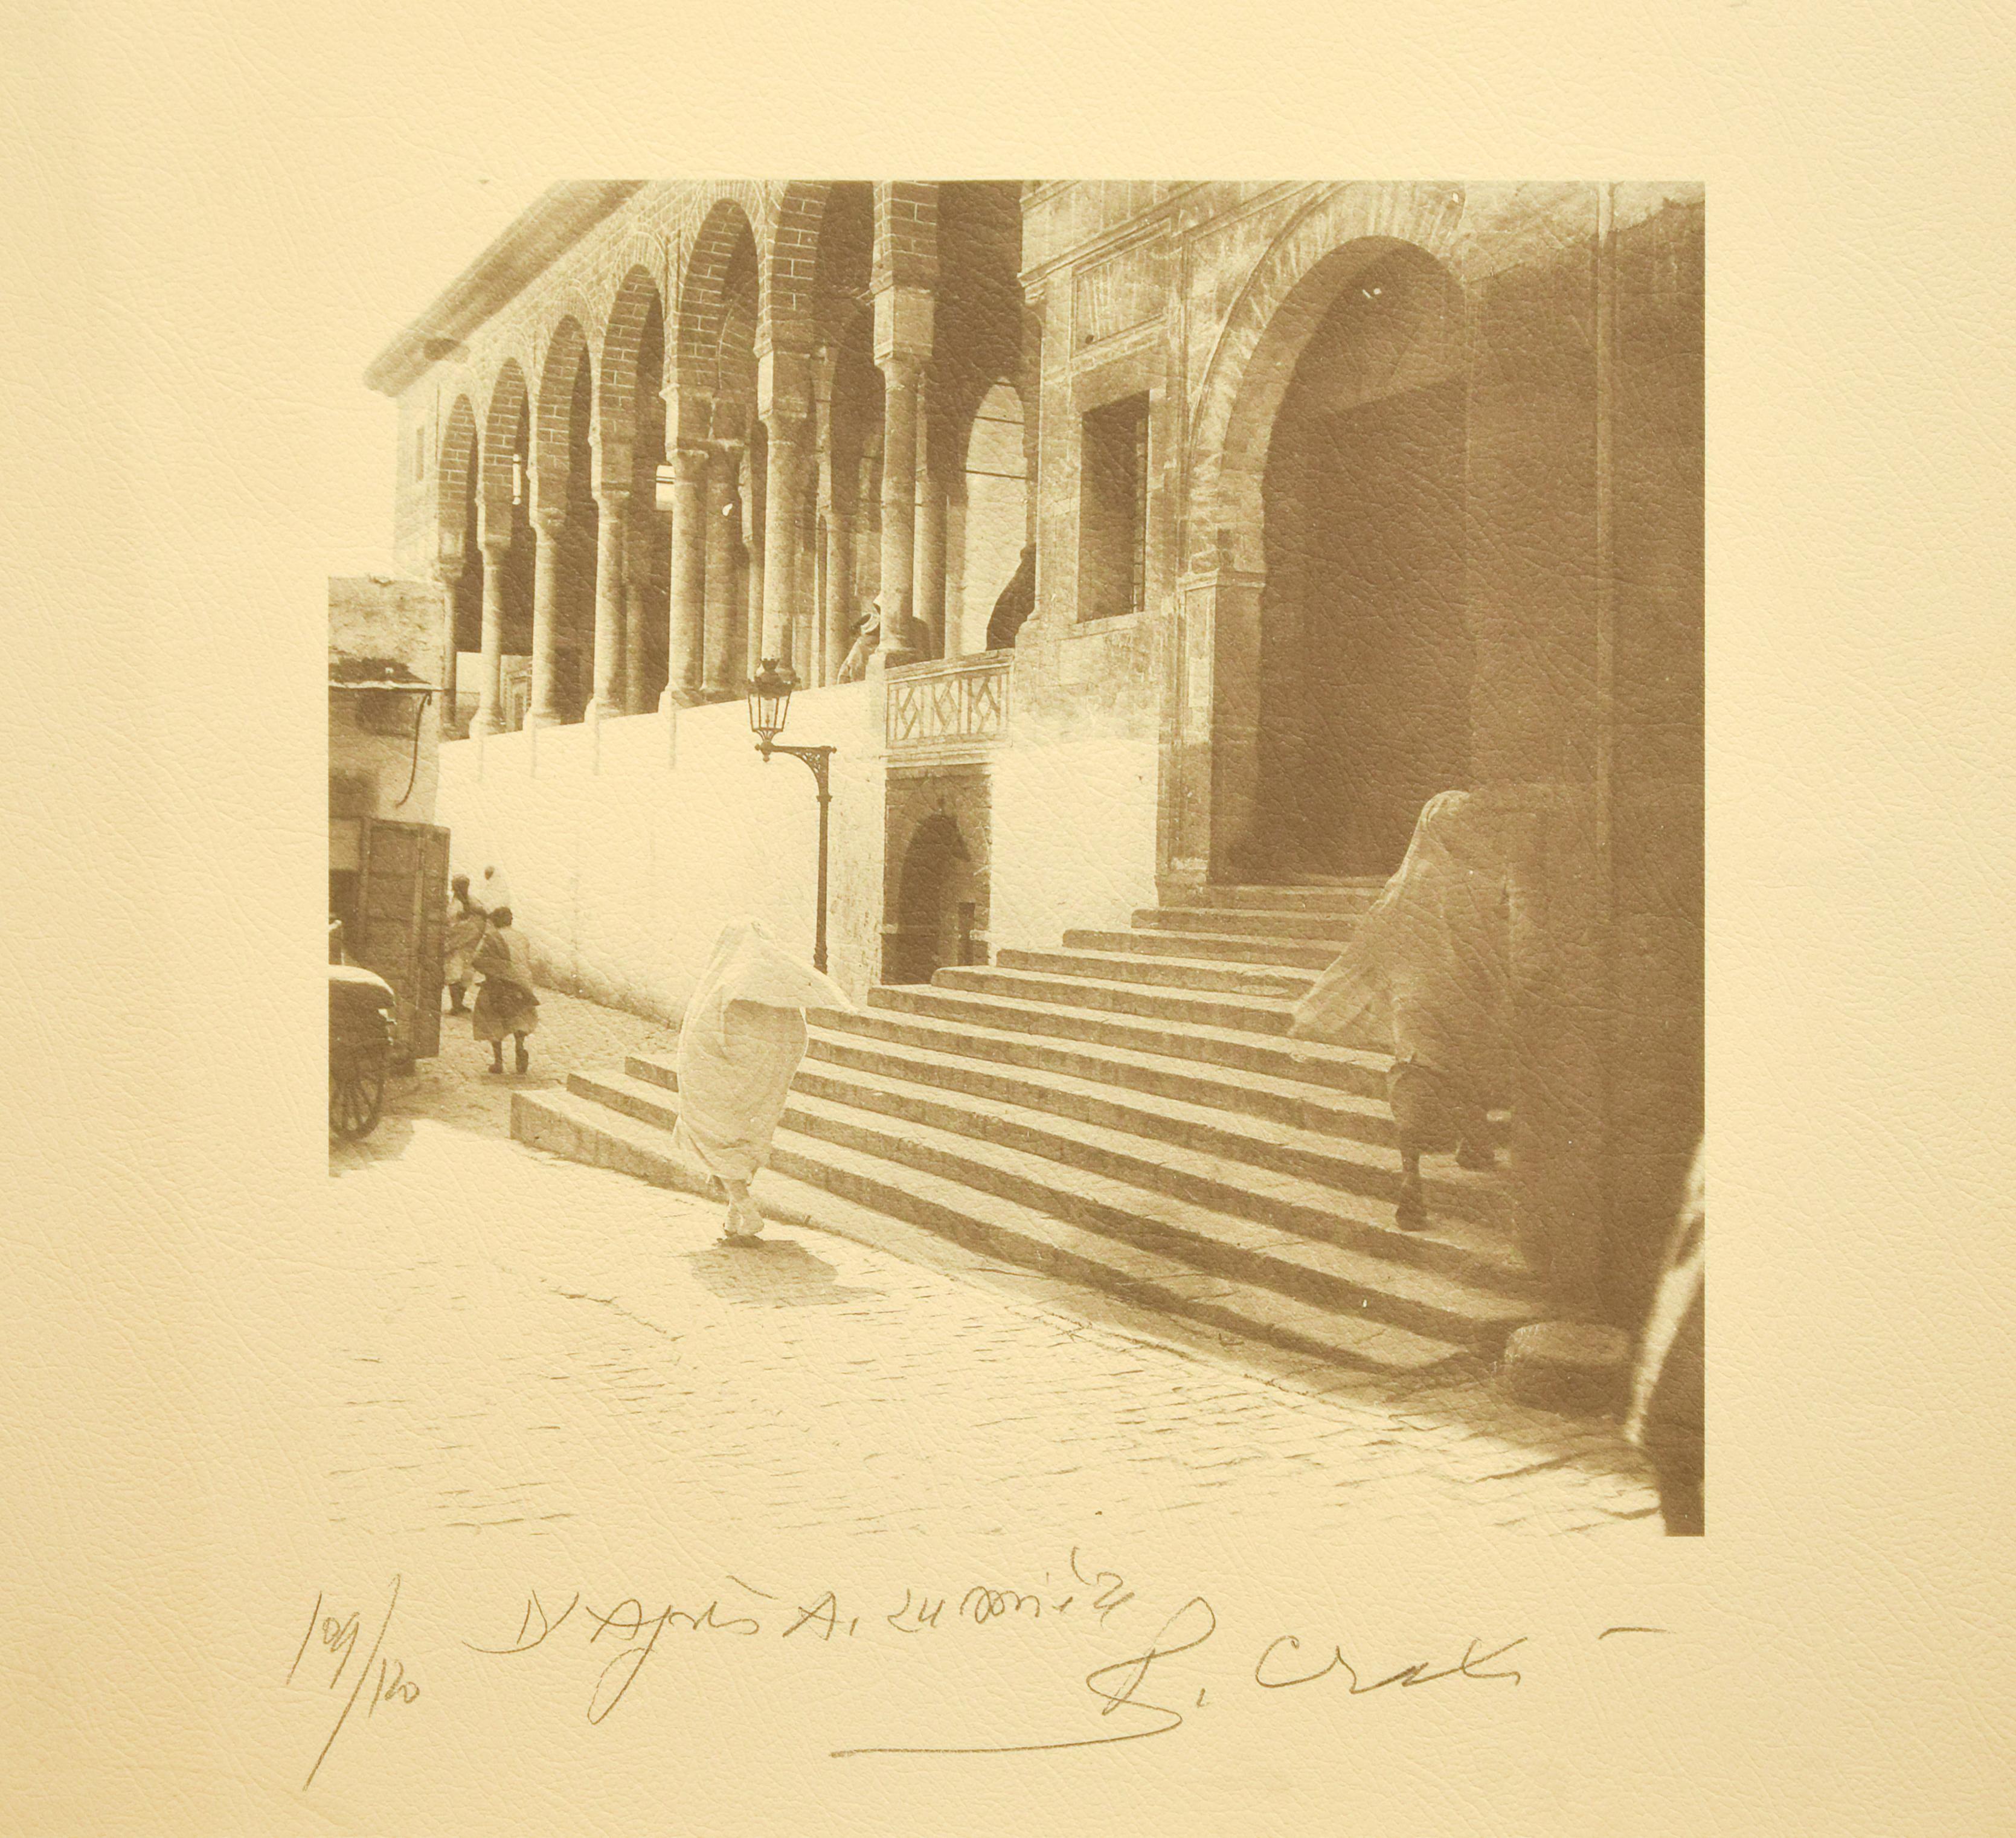 Zitouna Mosque - Tunisiaca - Original Photolithograph by Bettino Craxi - 1996